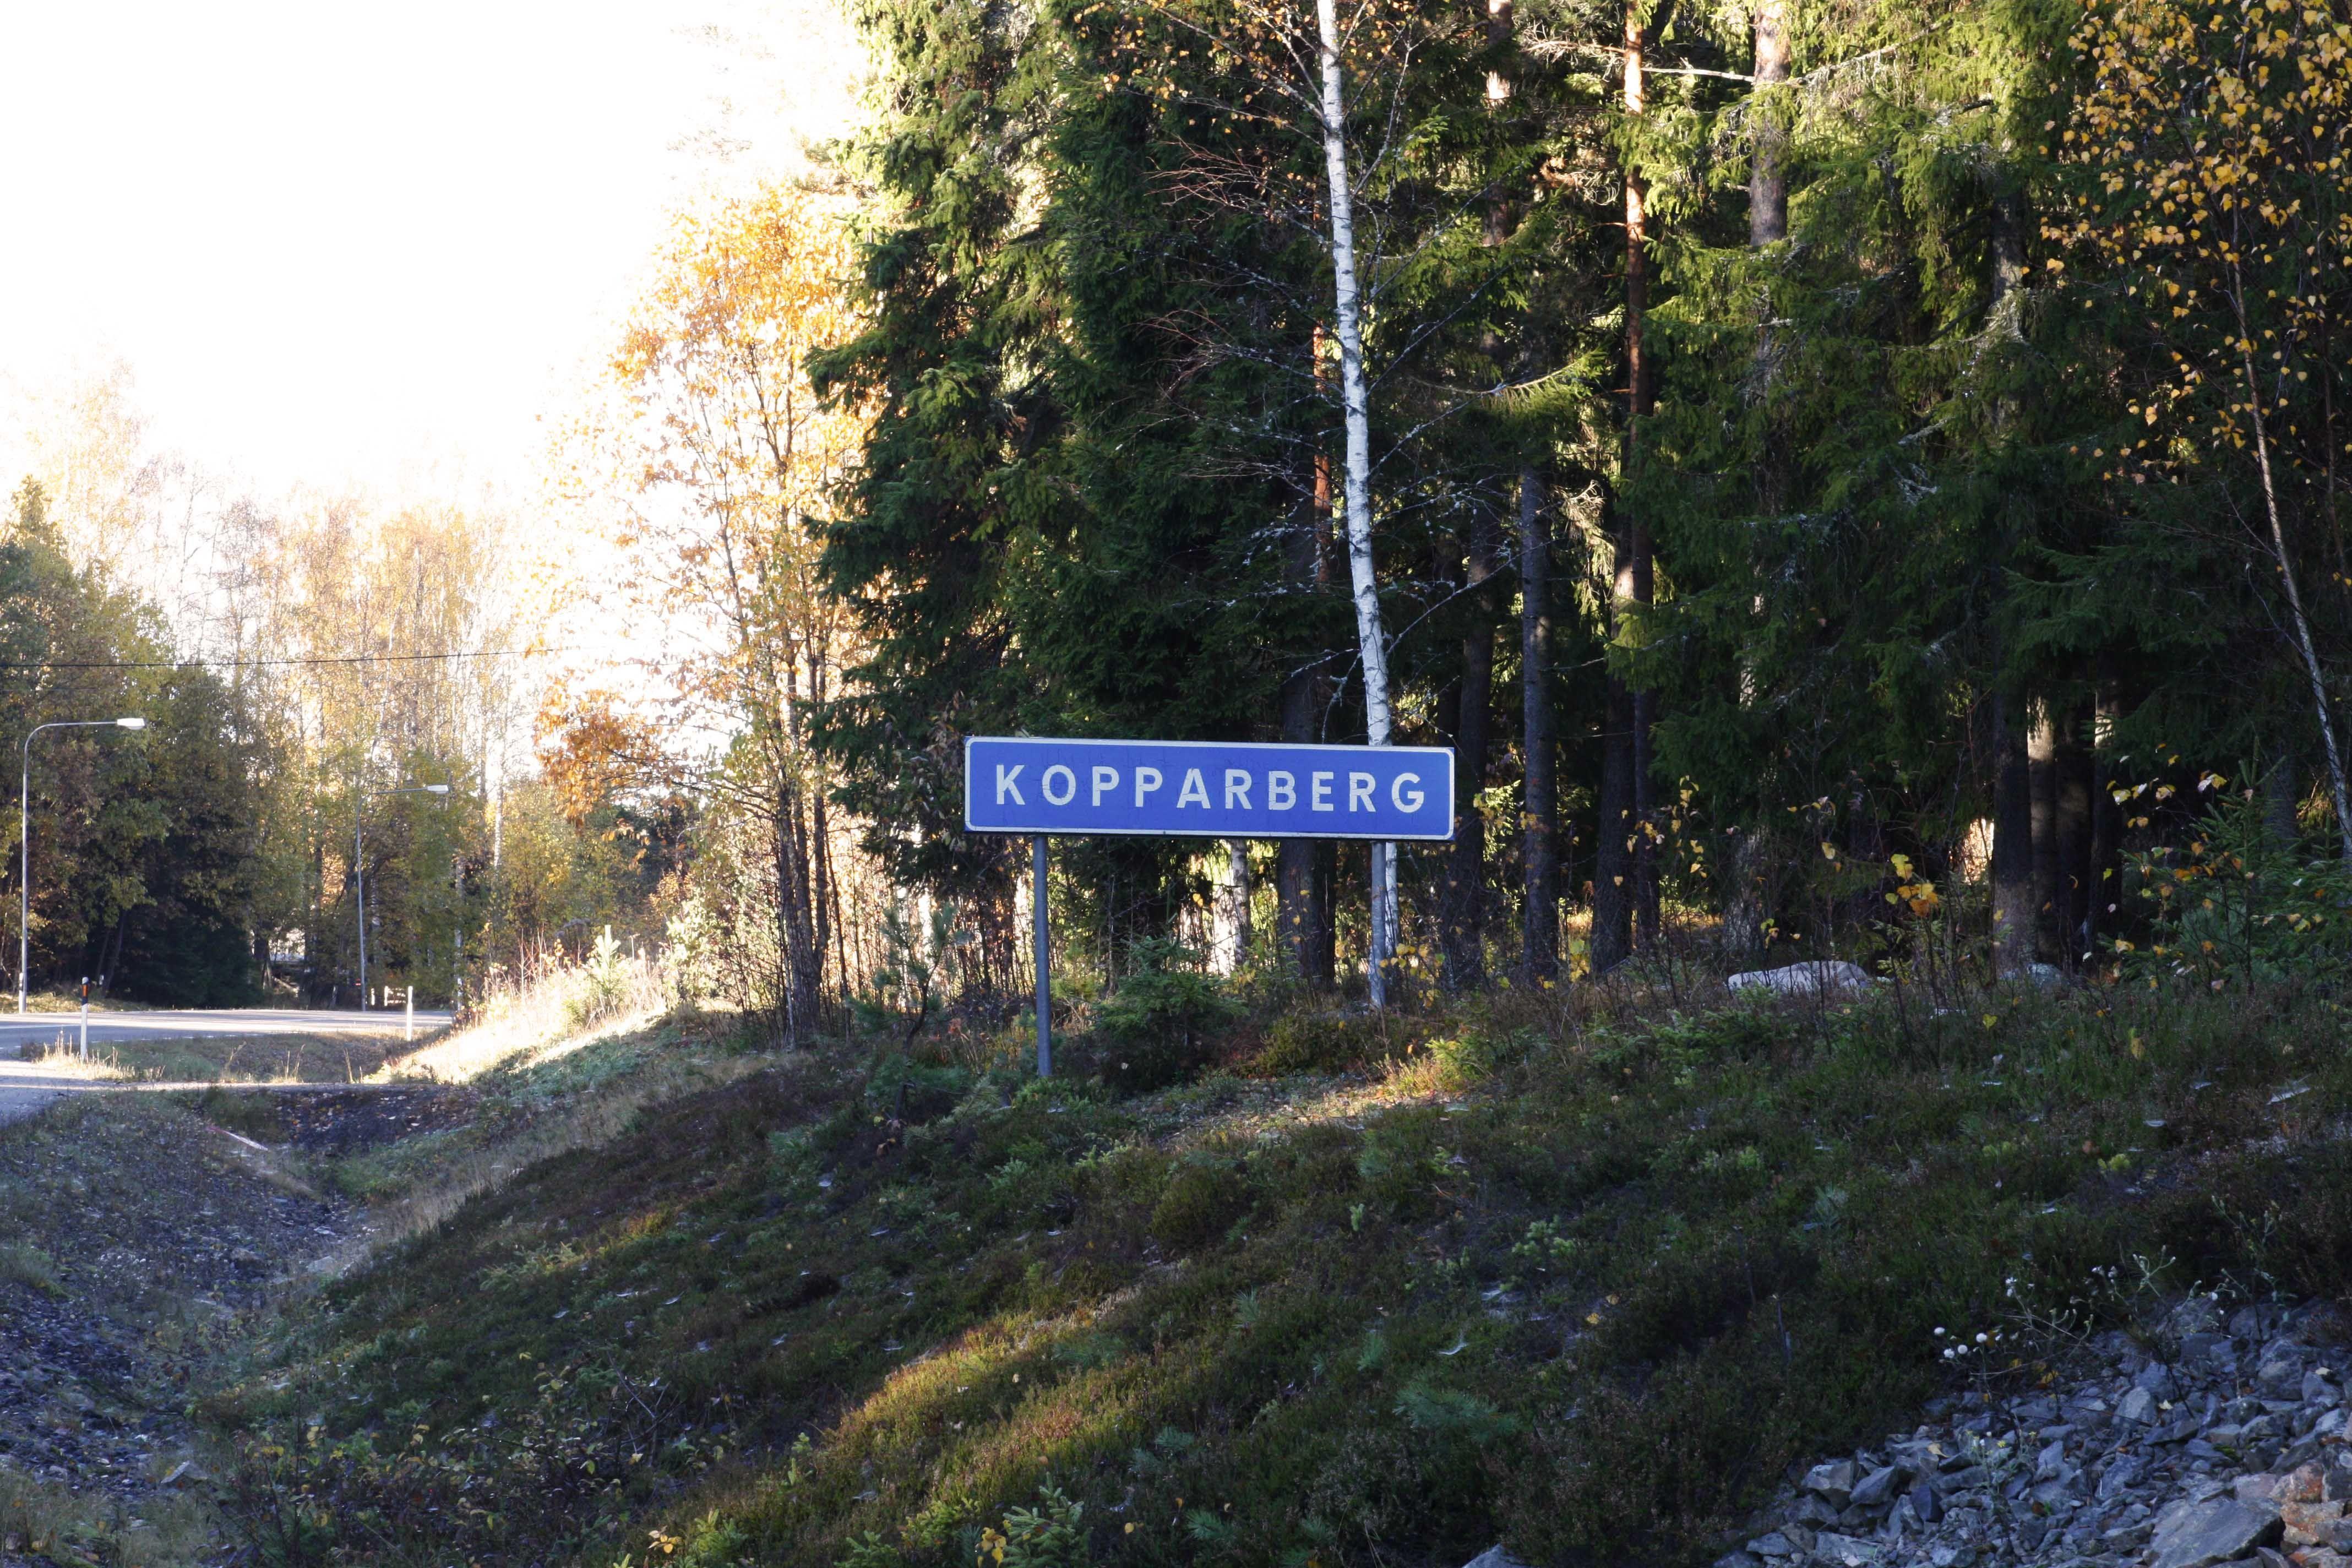 Kopparberg road sign